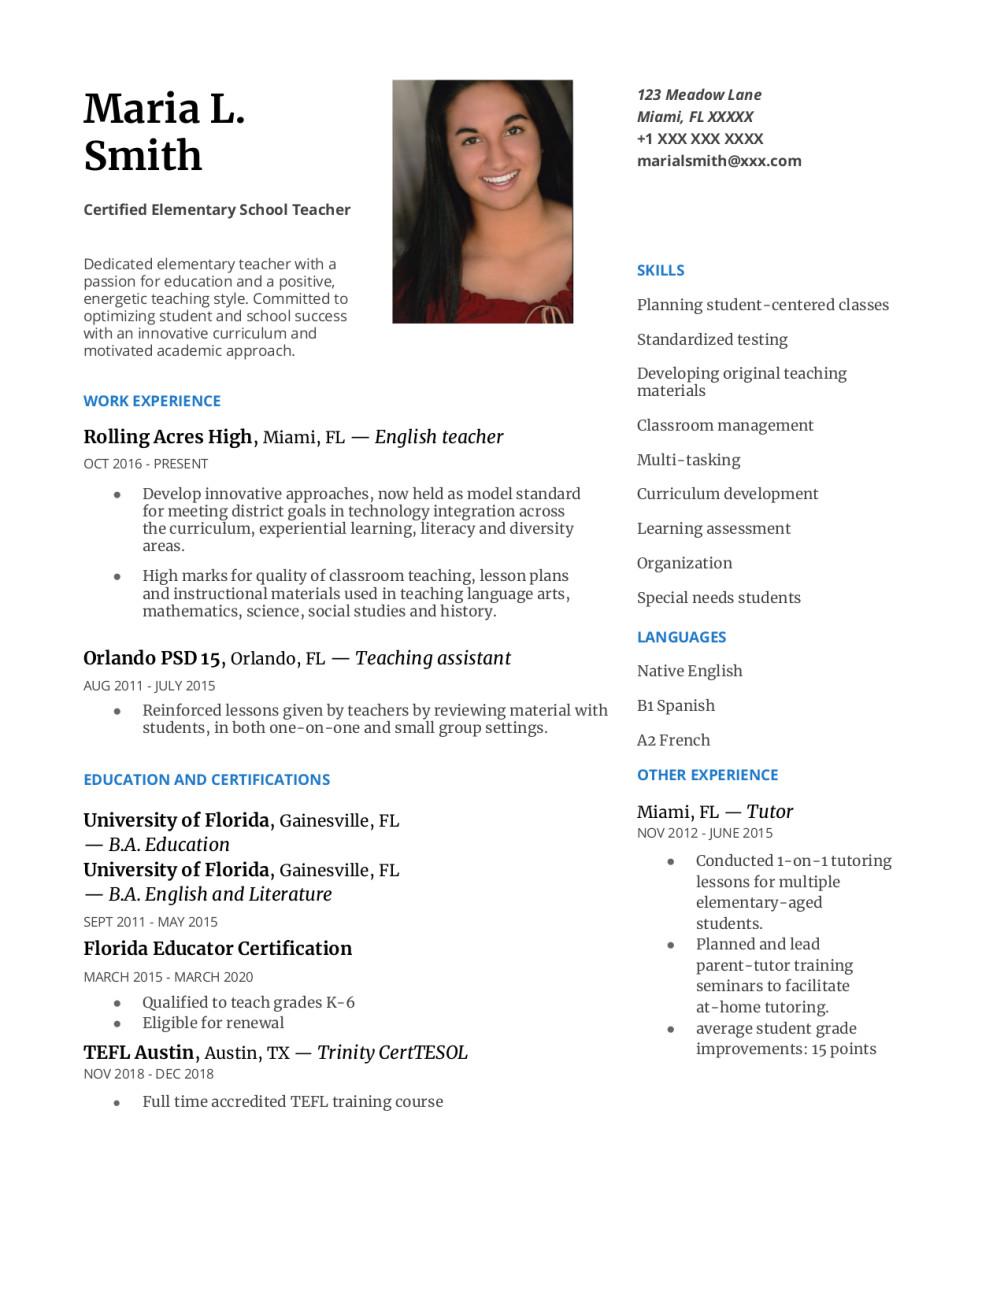 Edit Your Resume Cover Letter Or Linkedin Bio